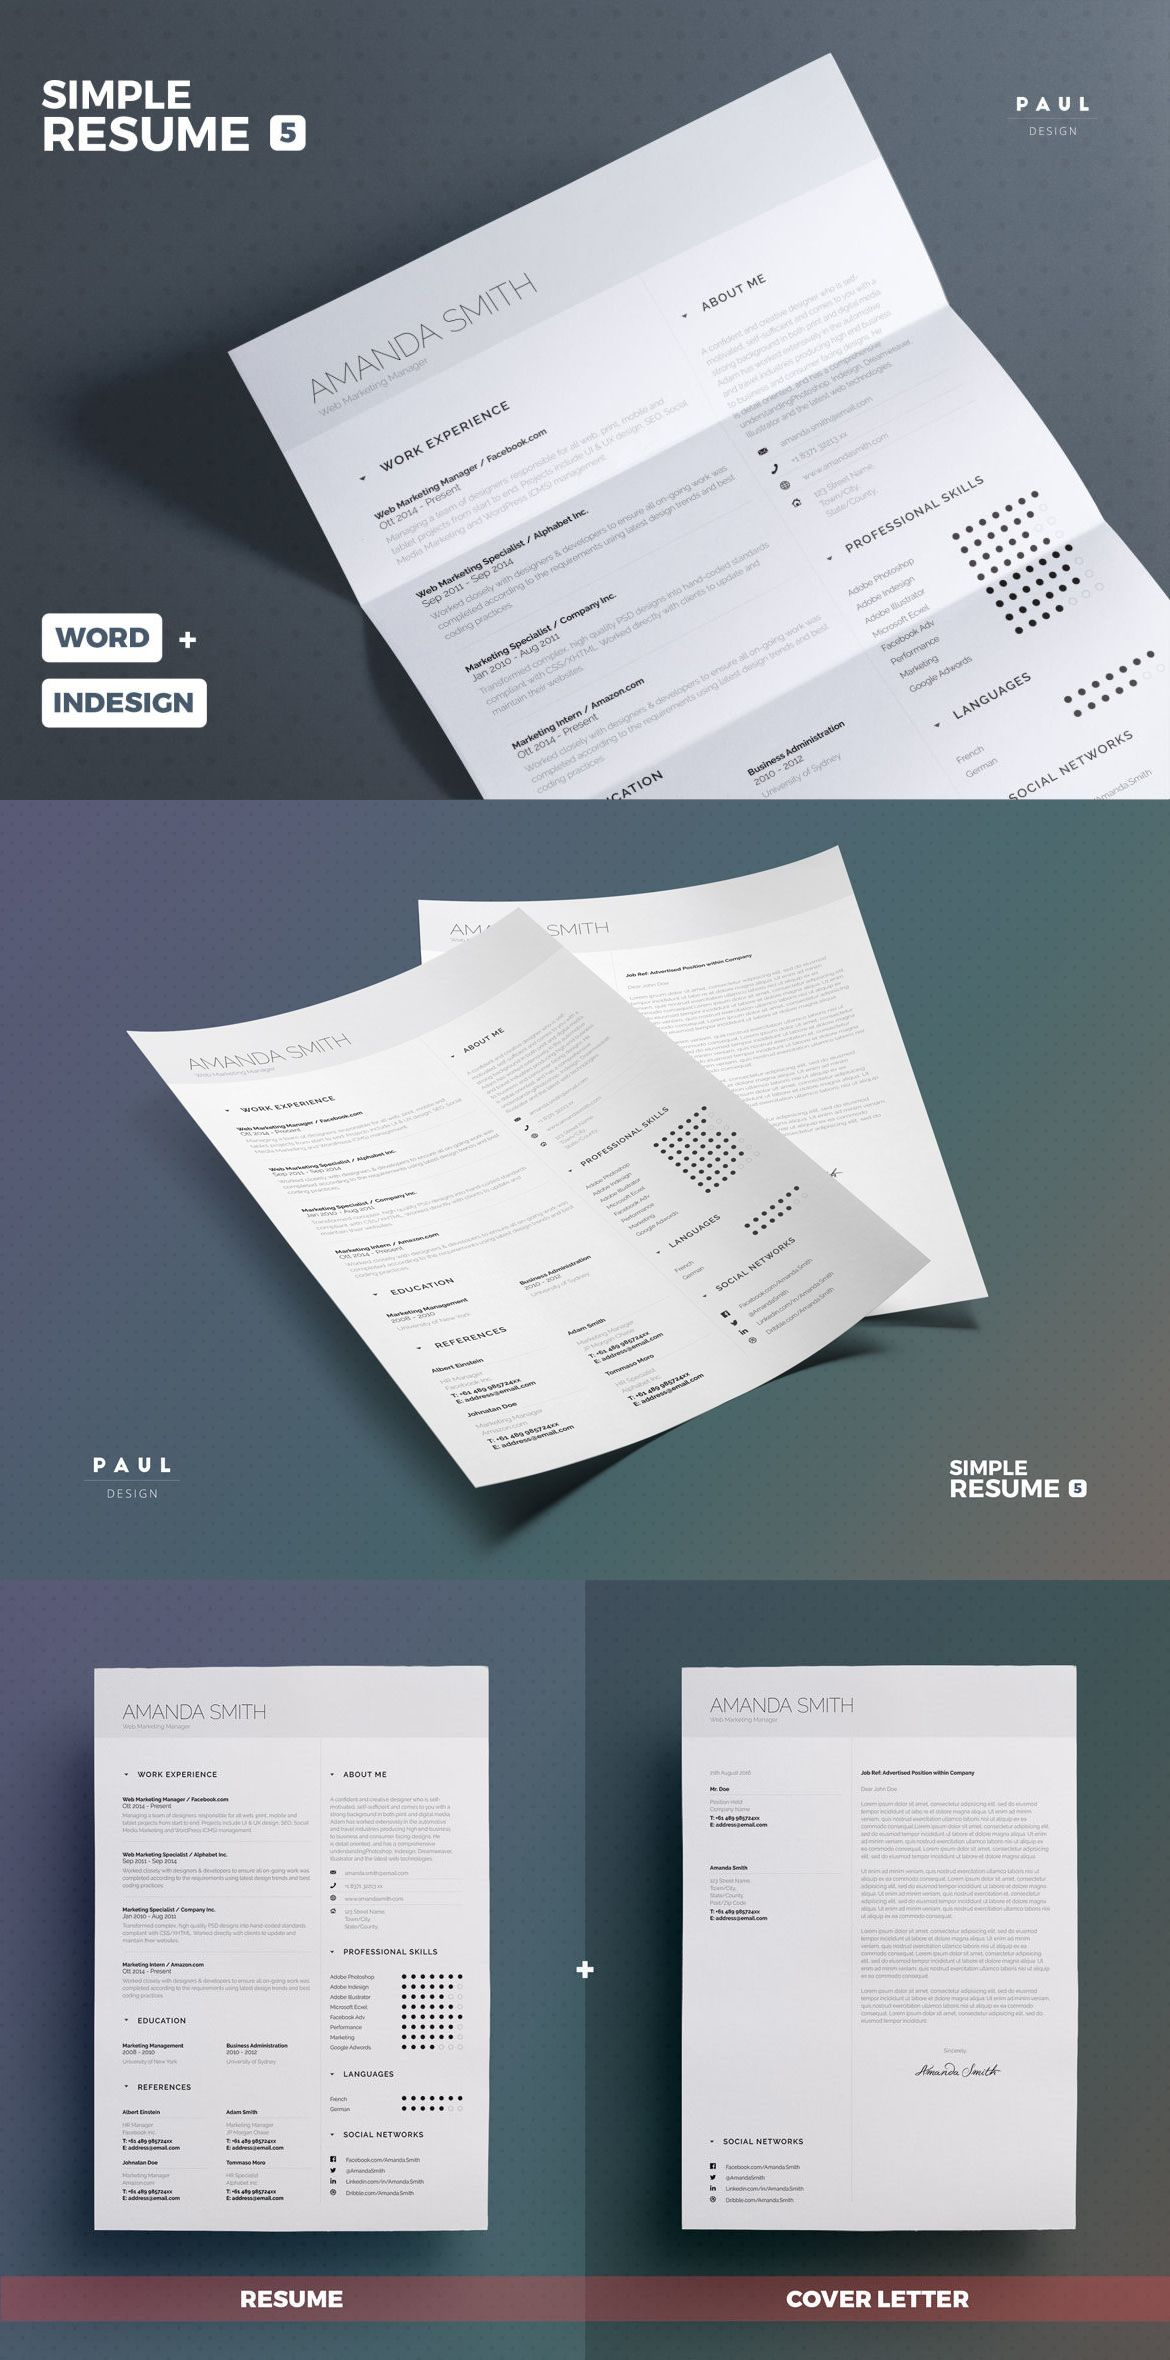 Simple Resume / Cv Template InDesign INDD, MS Word | Design | Pinterest